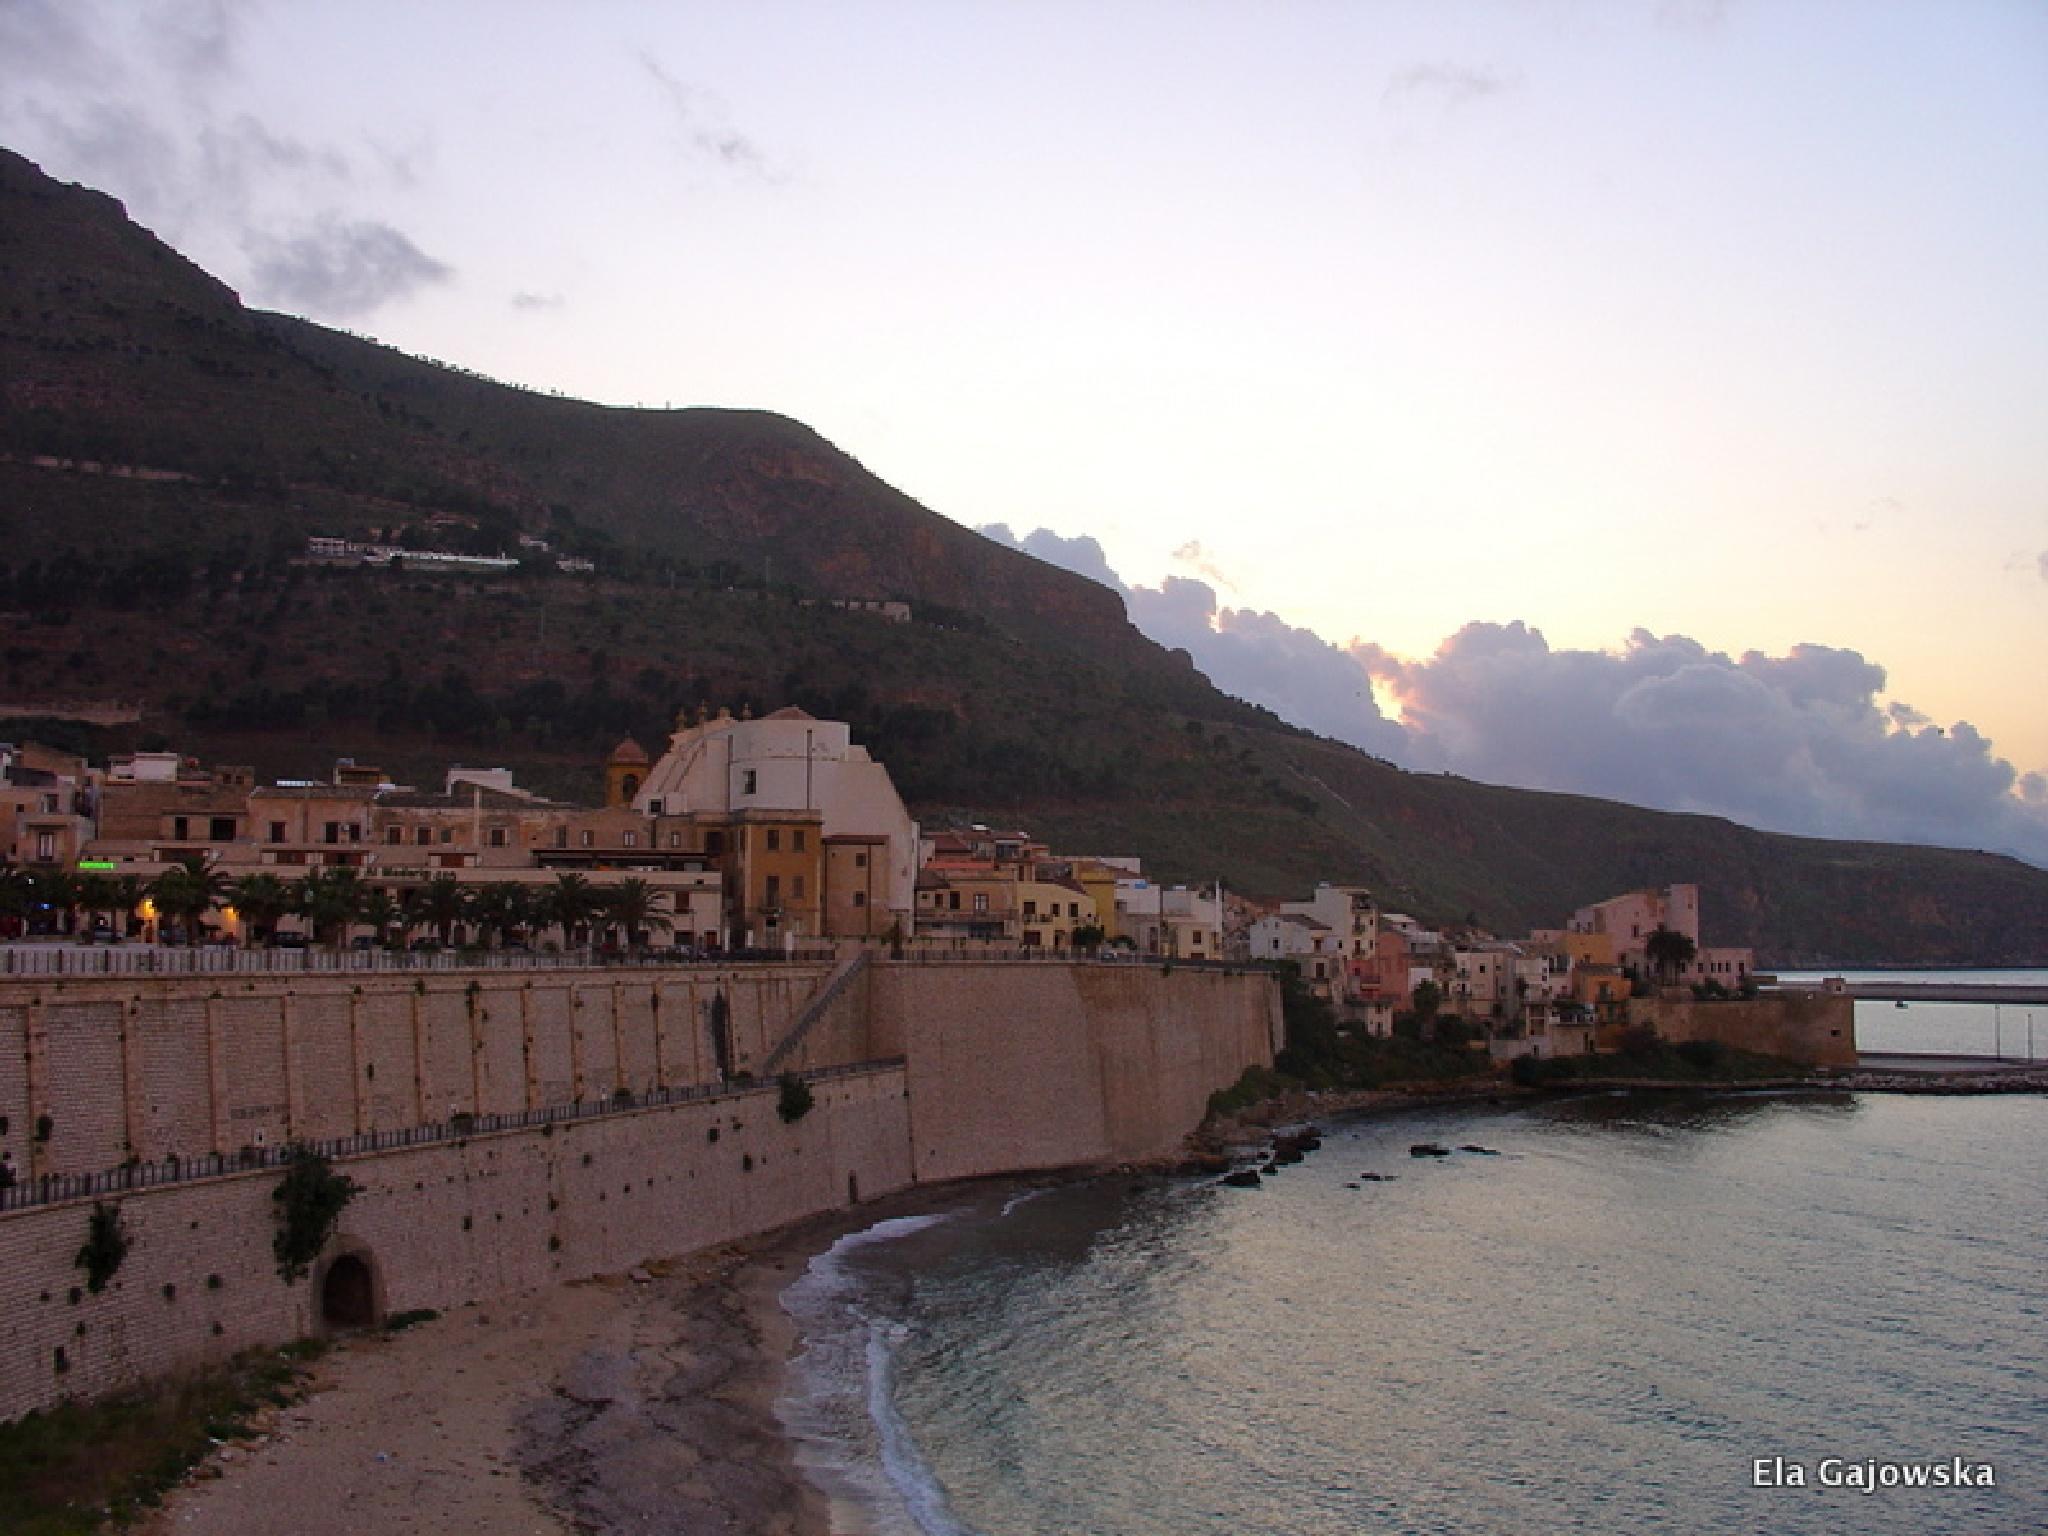 Sicily - just after sunset by Ela Gajowska